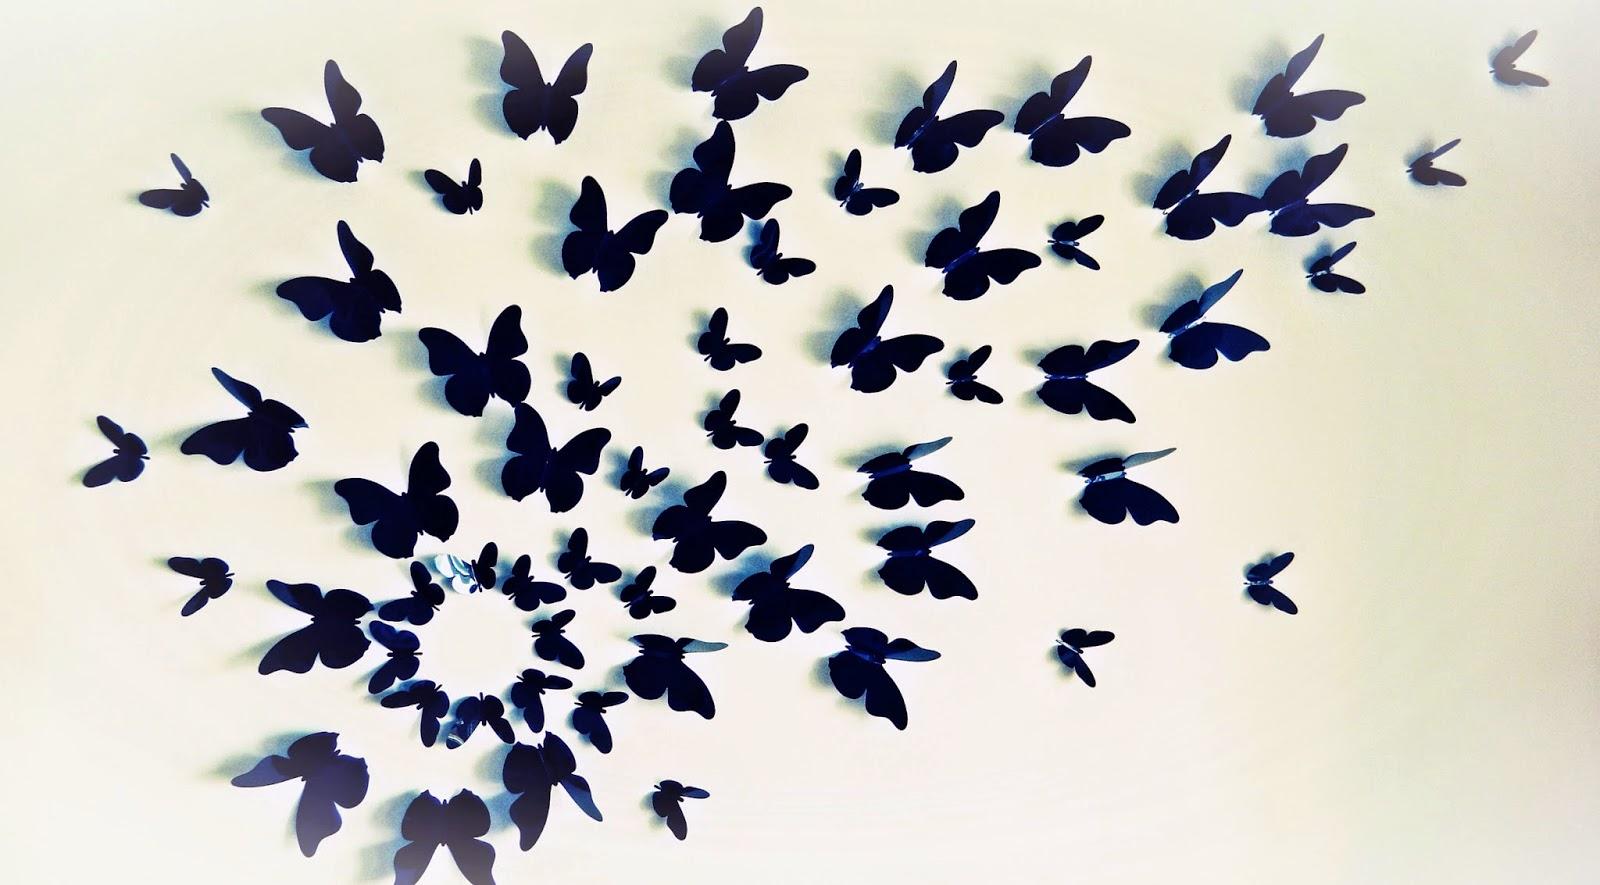 Декор стен бабочками своими руками: трафареты, материалы 82